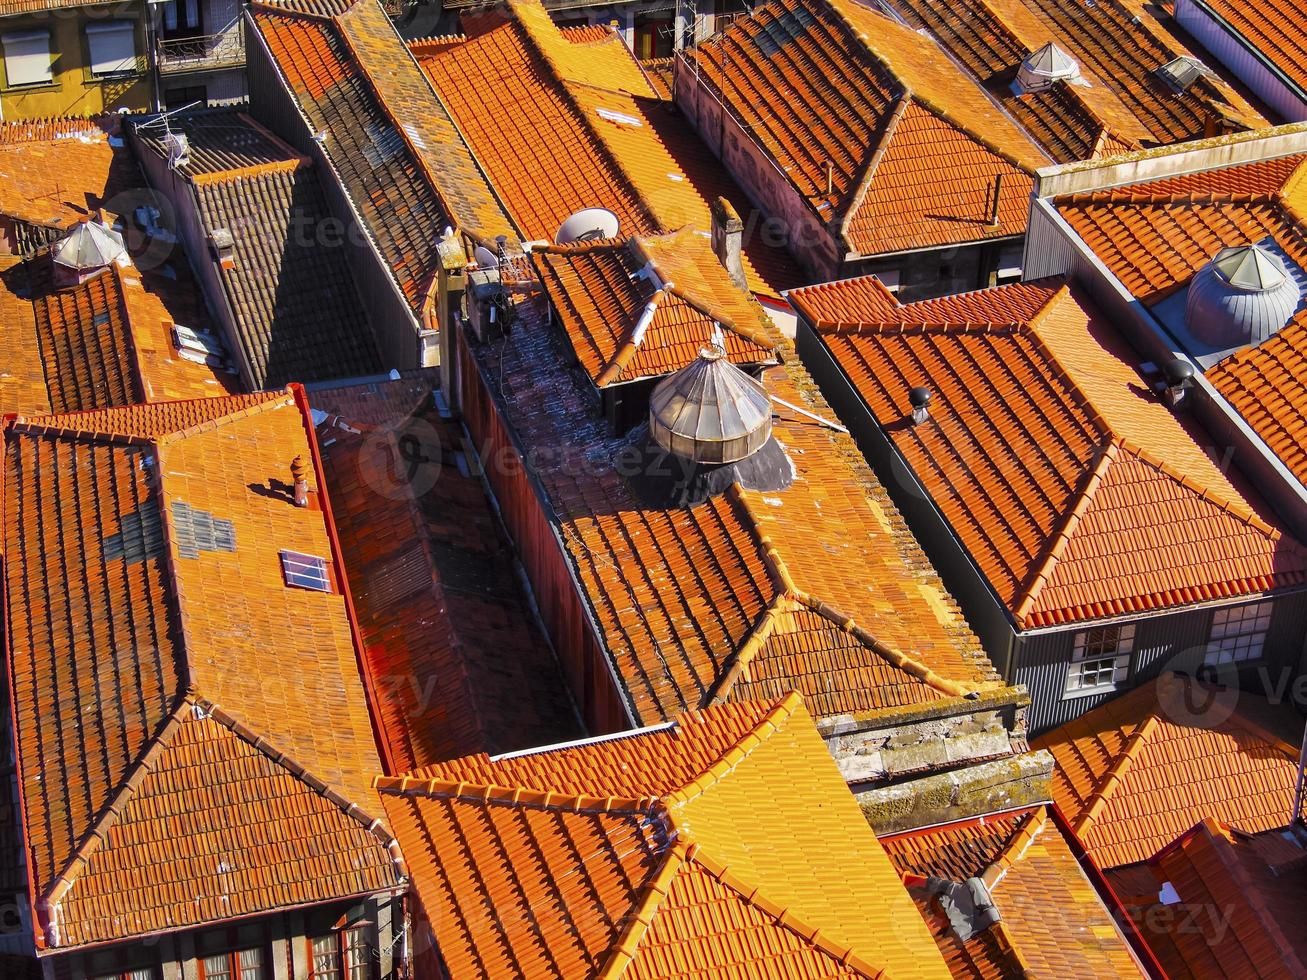 techos rojos de porto foto